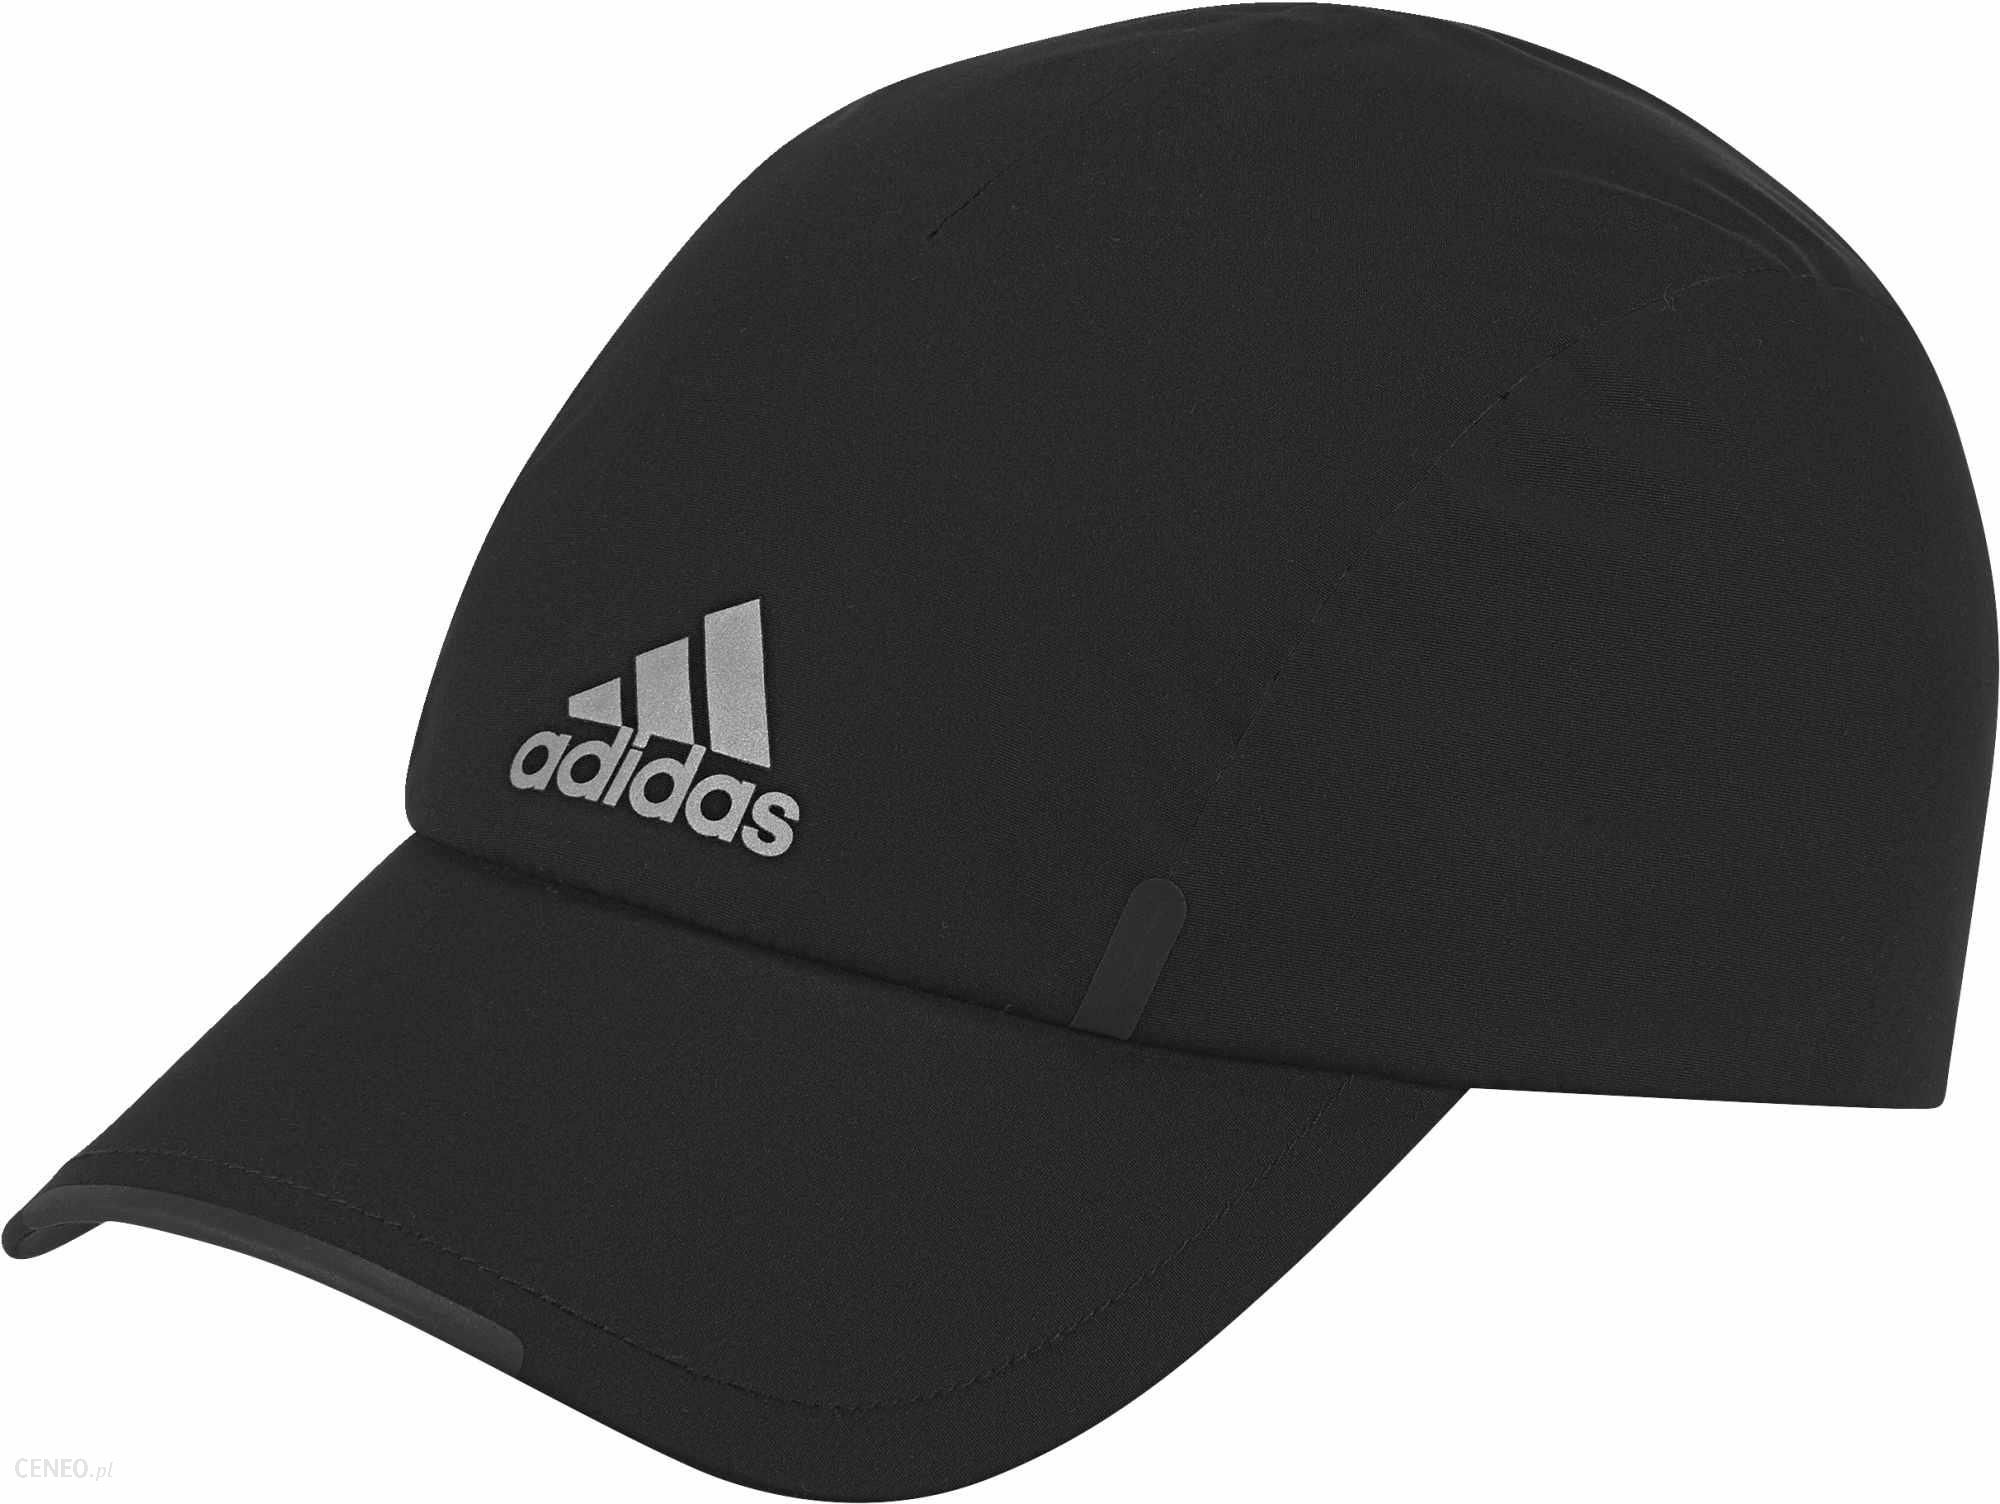 5dd3abae40ed1 Adidas czapka z daszkiem Run Clmpr Cap Black Black Reflective Reflective  Silver Osfm -